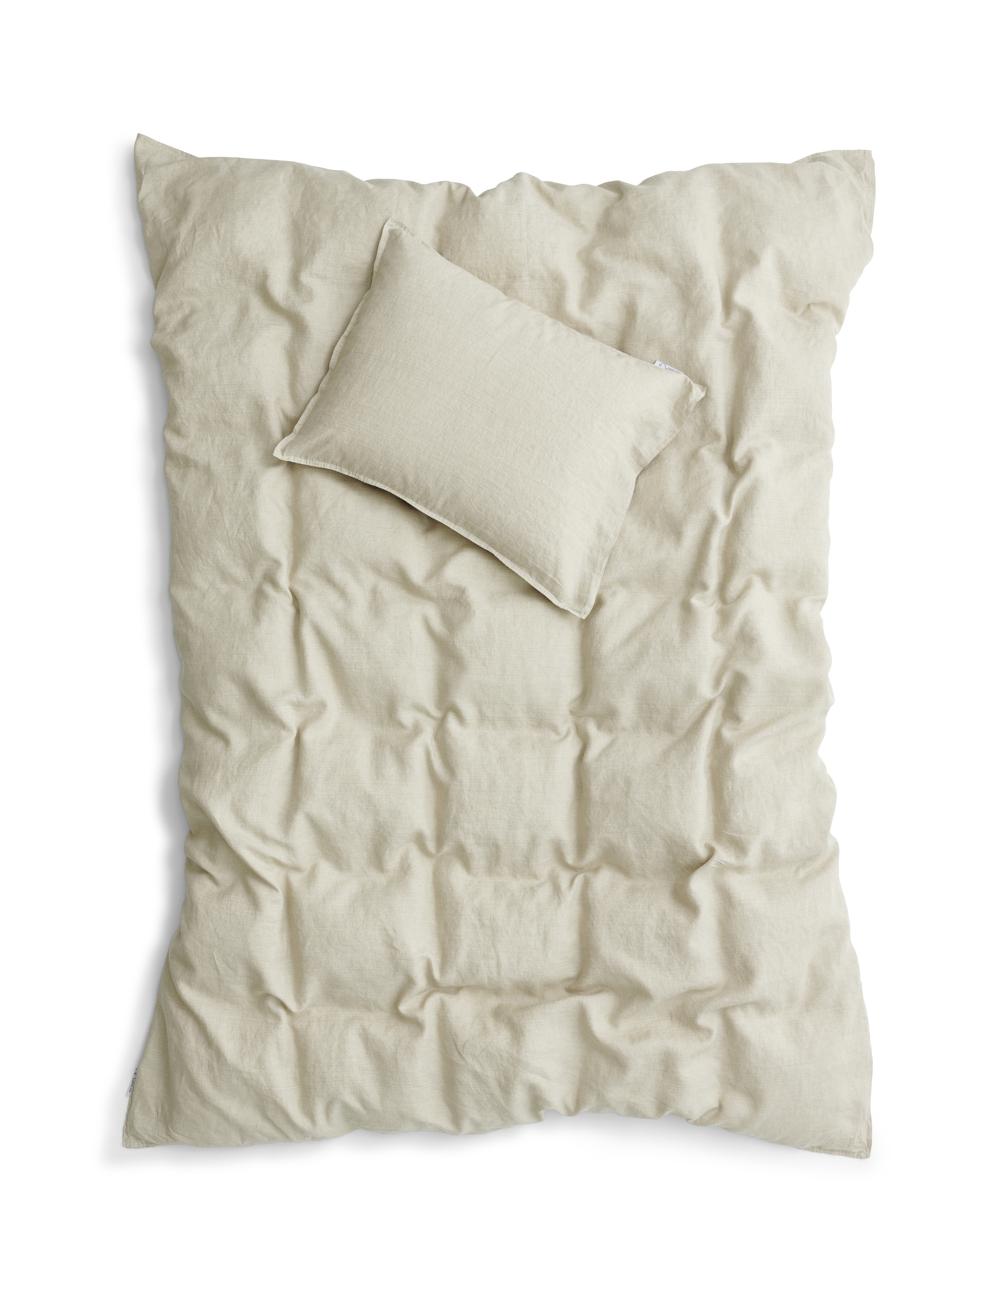 Duvet Cover Set Linen Natural